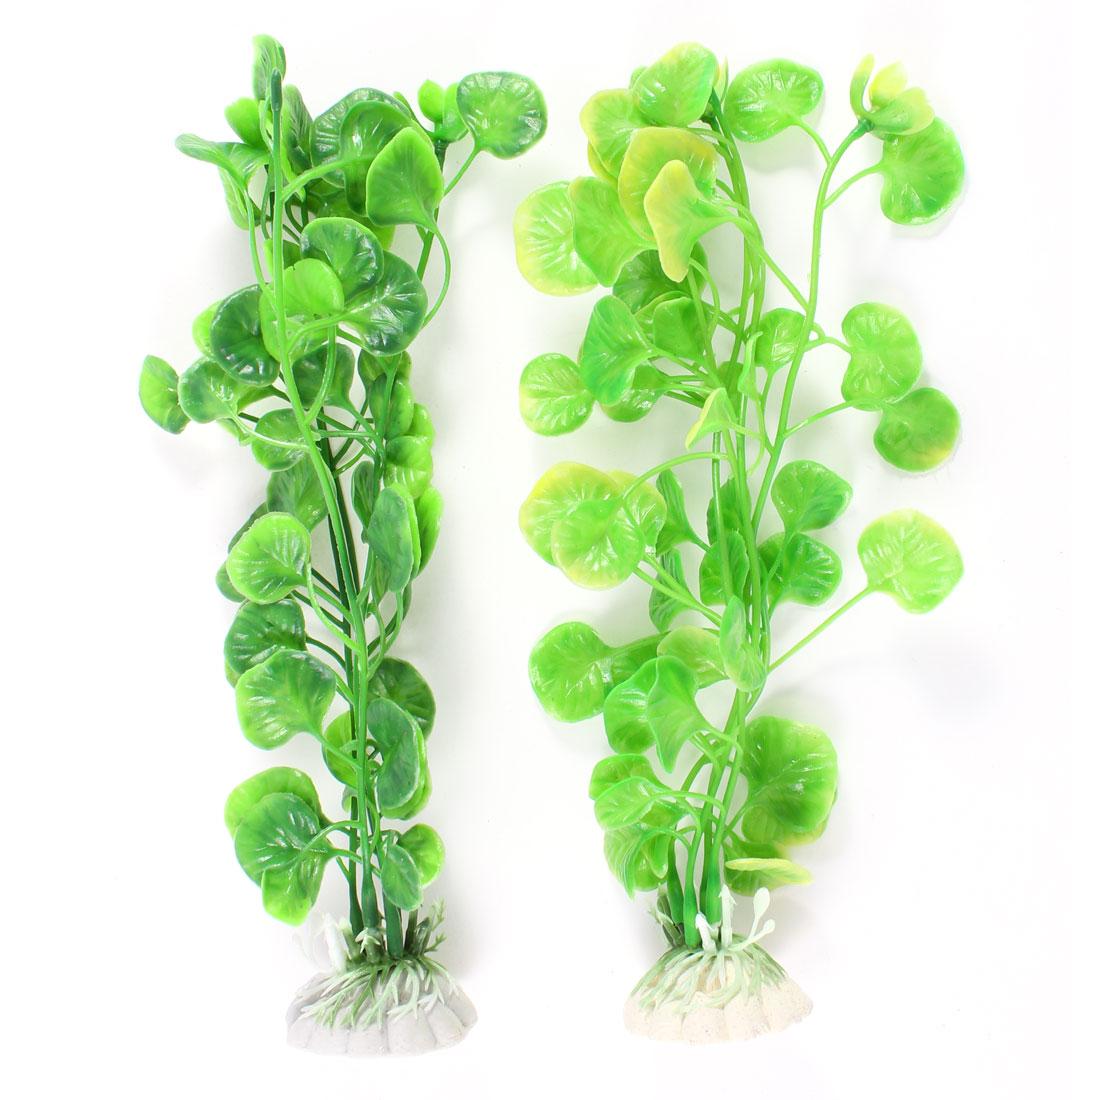 "2 Pcs Green Yellow Plastic Underwater Plants Decor 8.7"" High for Aquarium"